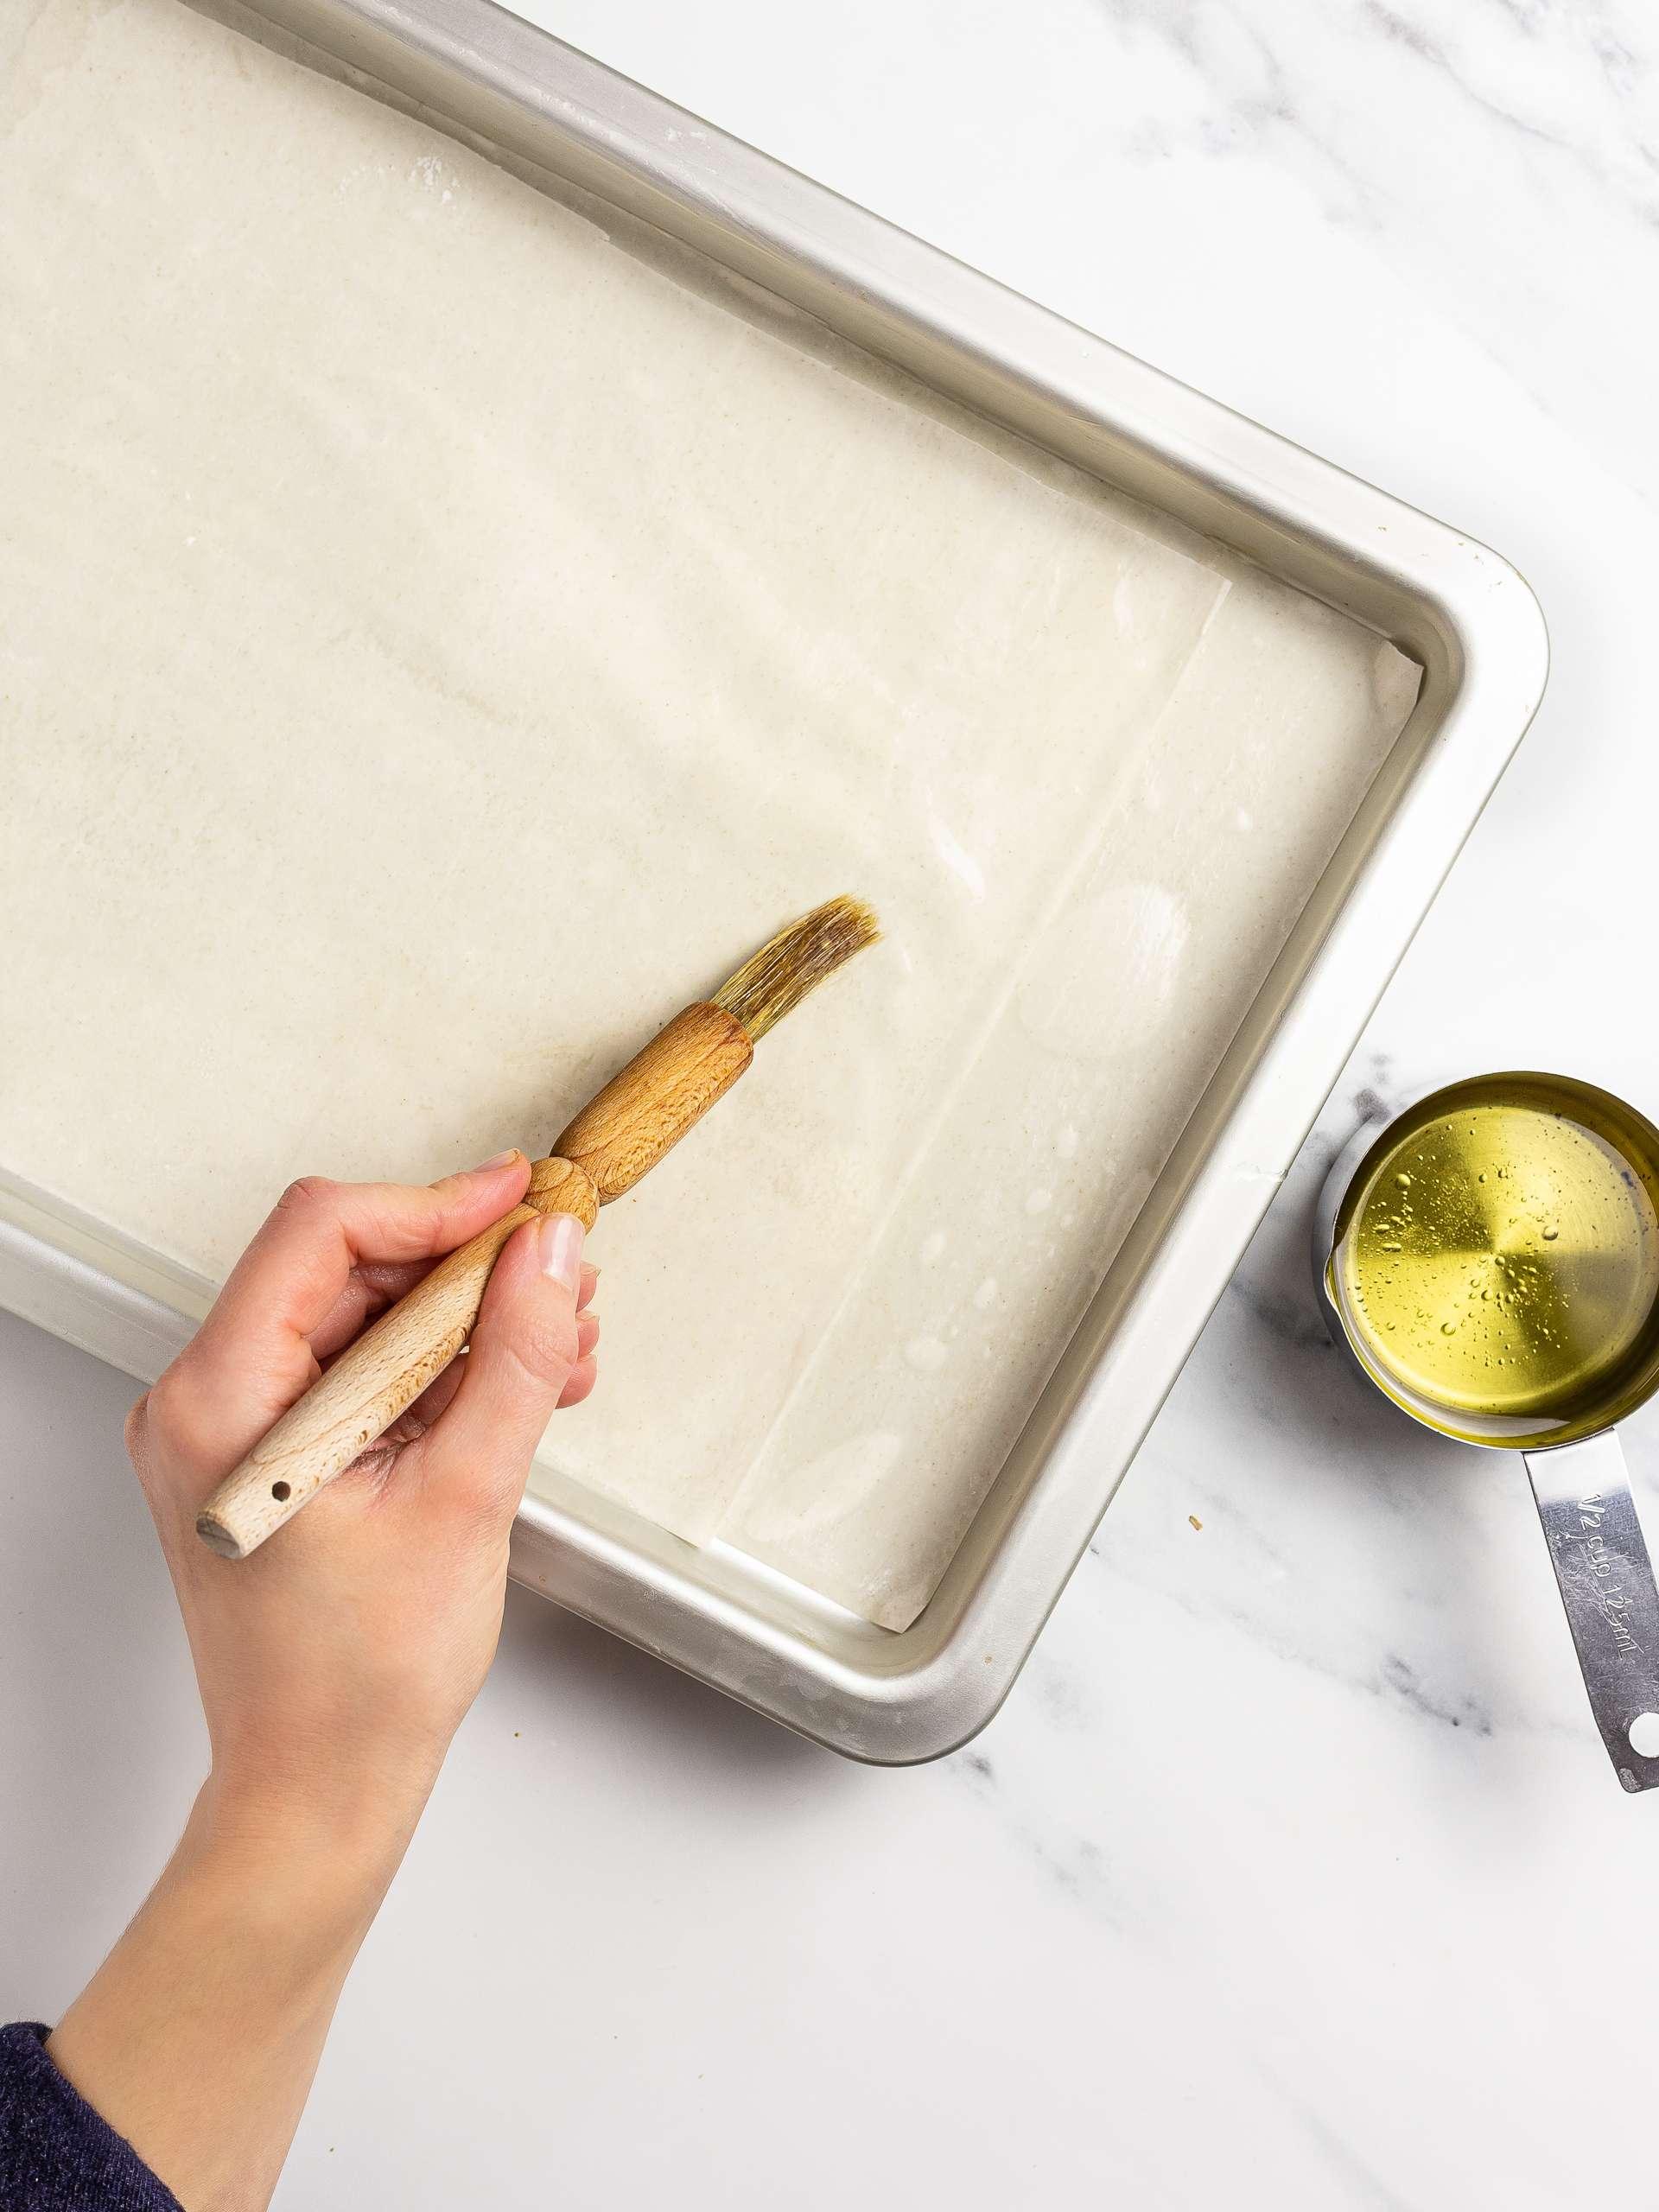 filo pastry for baklava